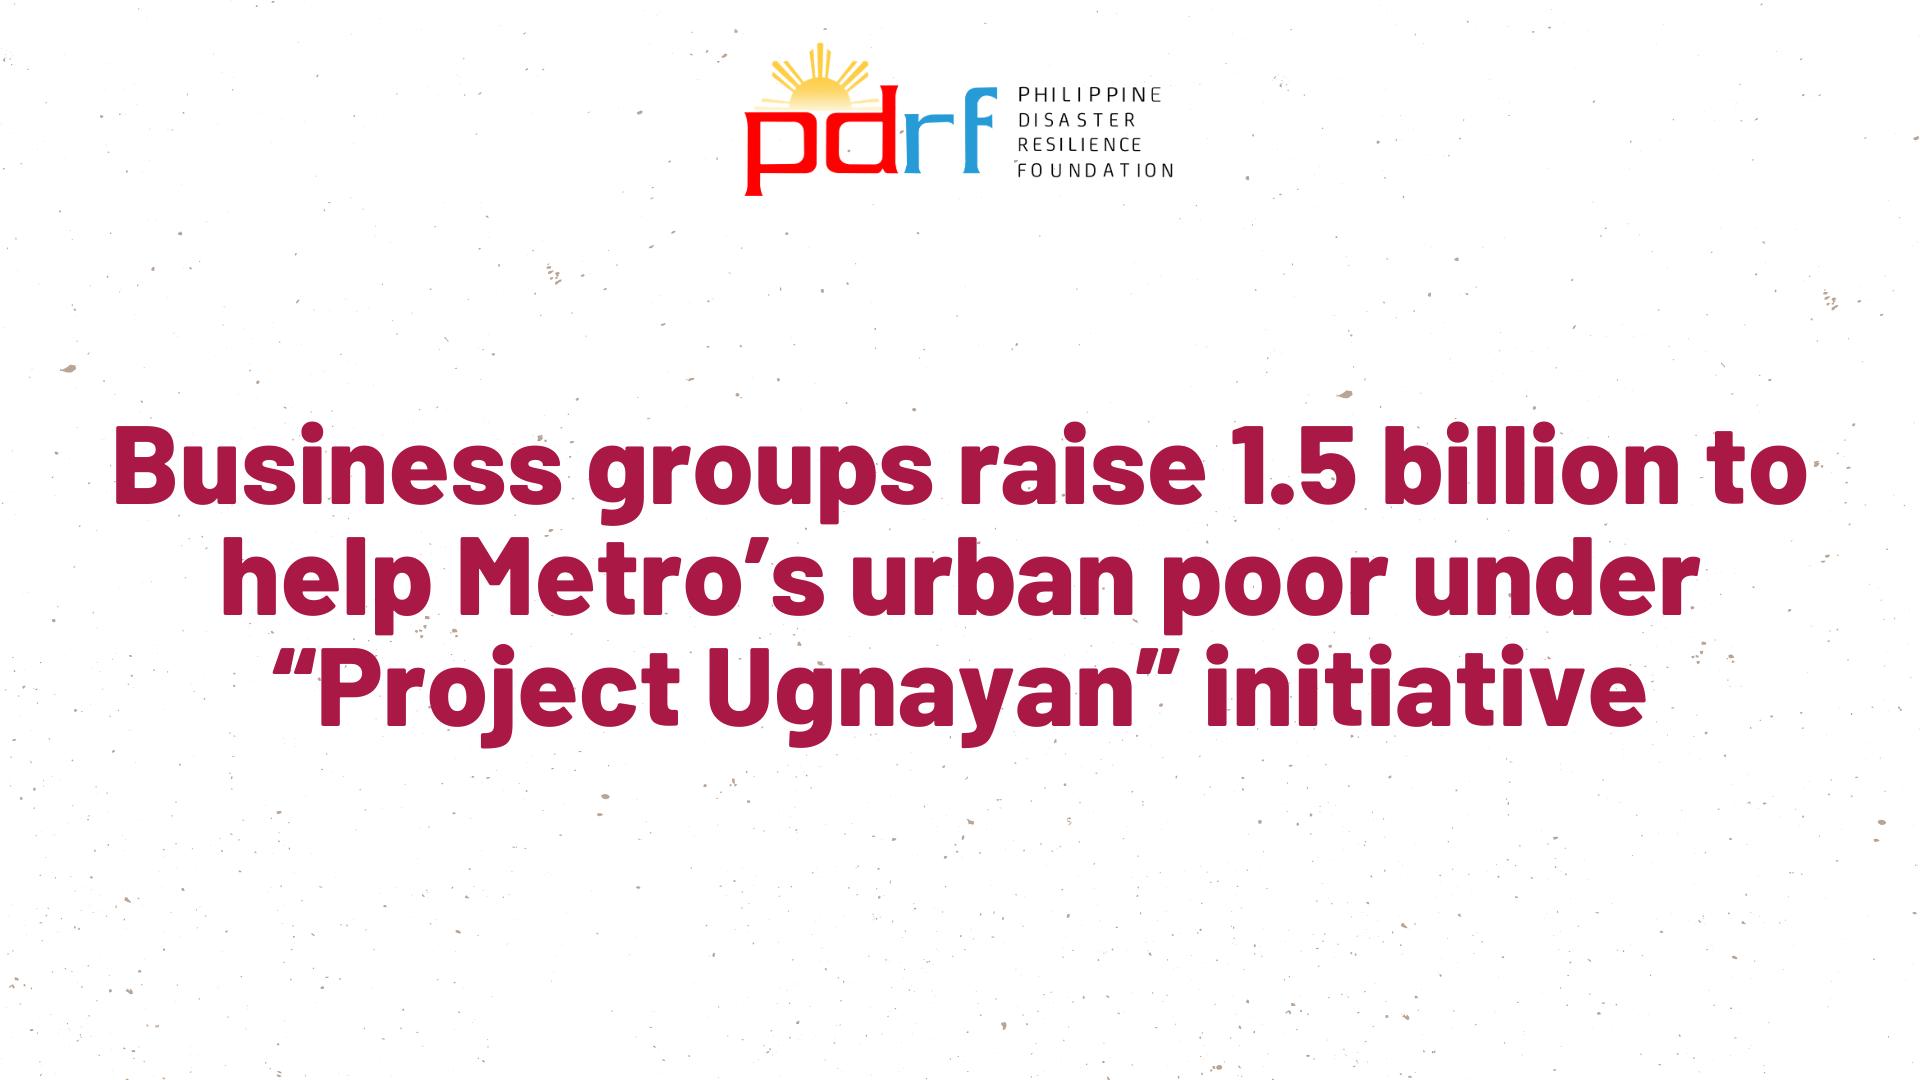 "Business groups raise 1.5 Billion to help Metro's urban poor under ""Project Ugnayan"" initiative"